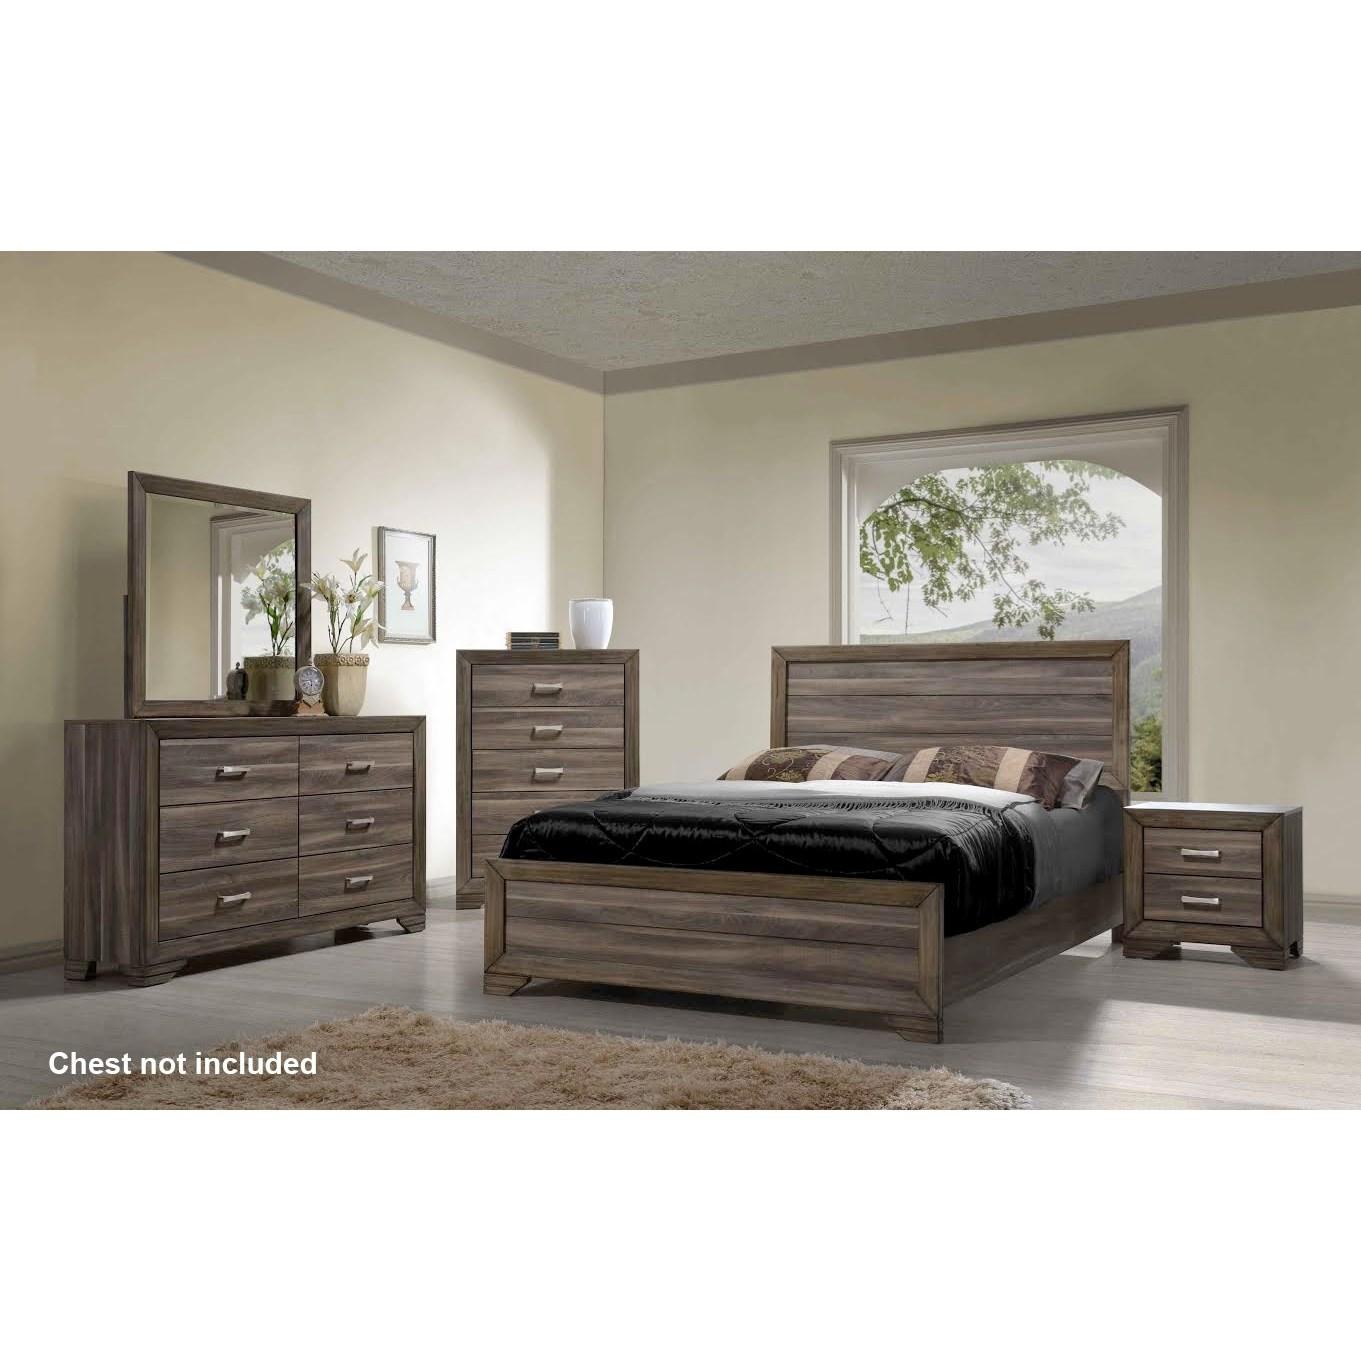 Asheville King Bedroom Group by Bernards at Westrich Furniture & Appliances